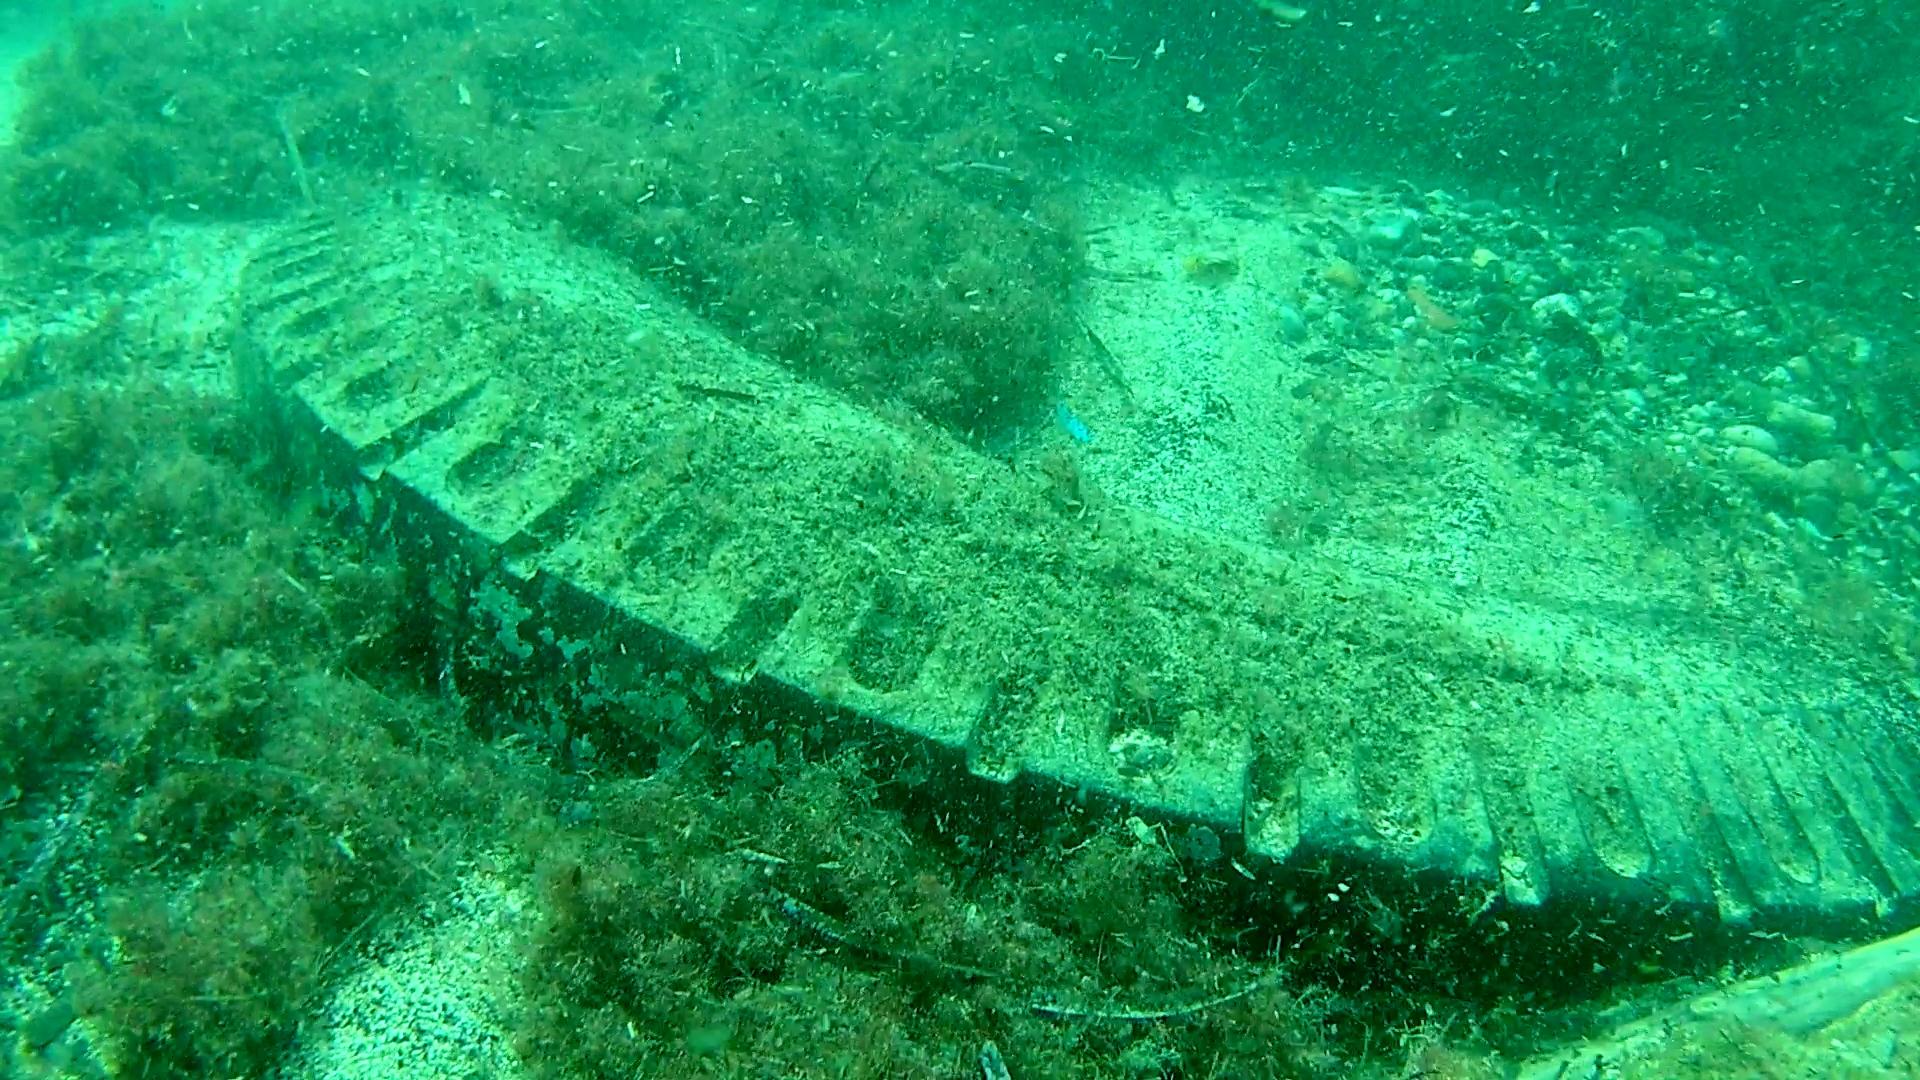 pneumatico in mare - tire in the sea - intotheblue.it